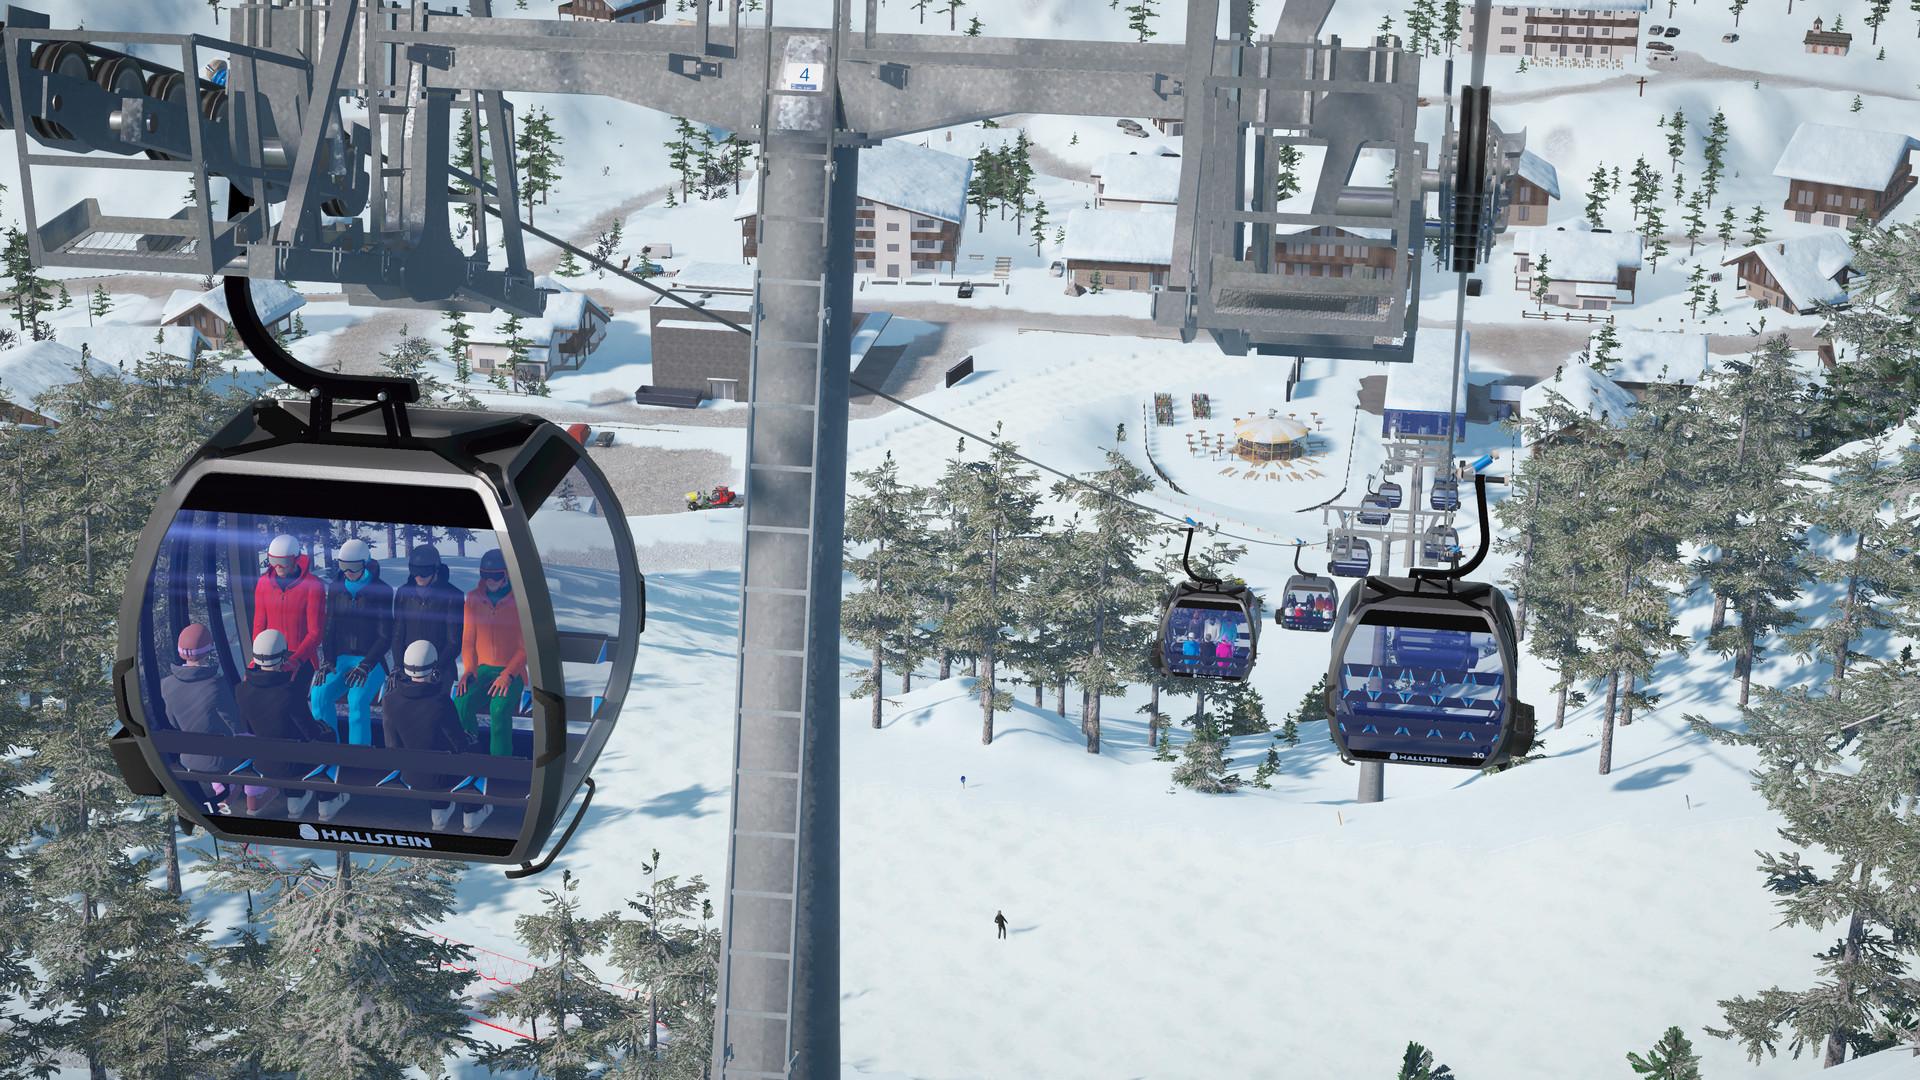 winter-resort-simulator-s2-pc-screenshot-02